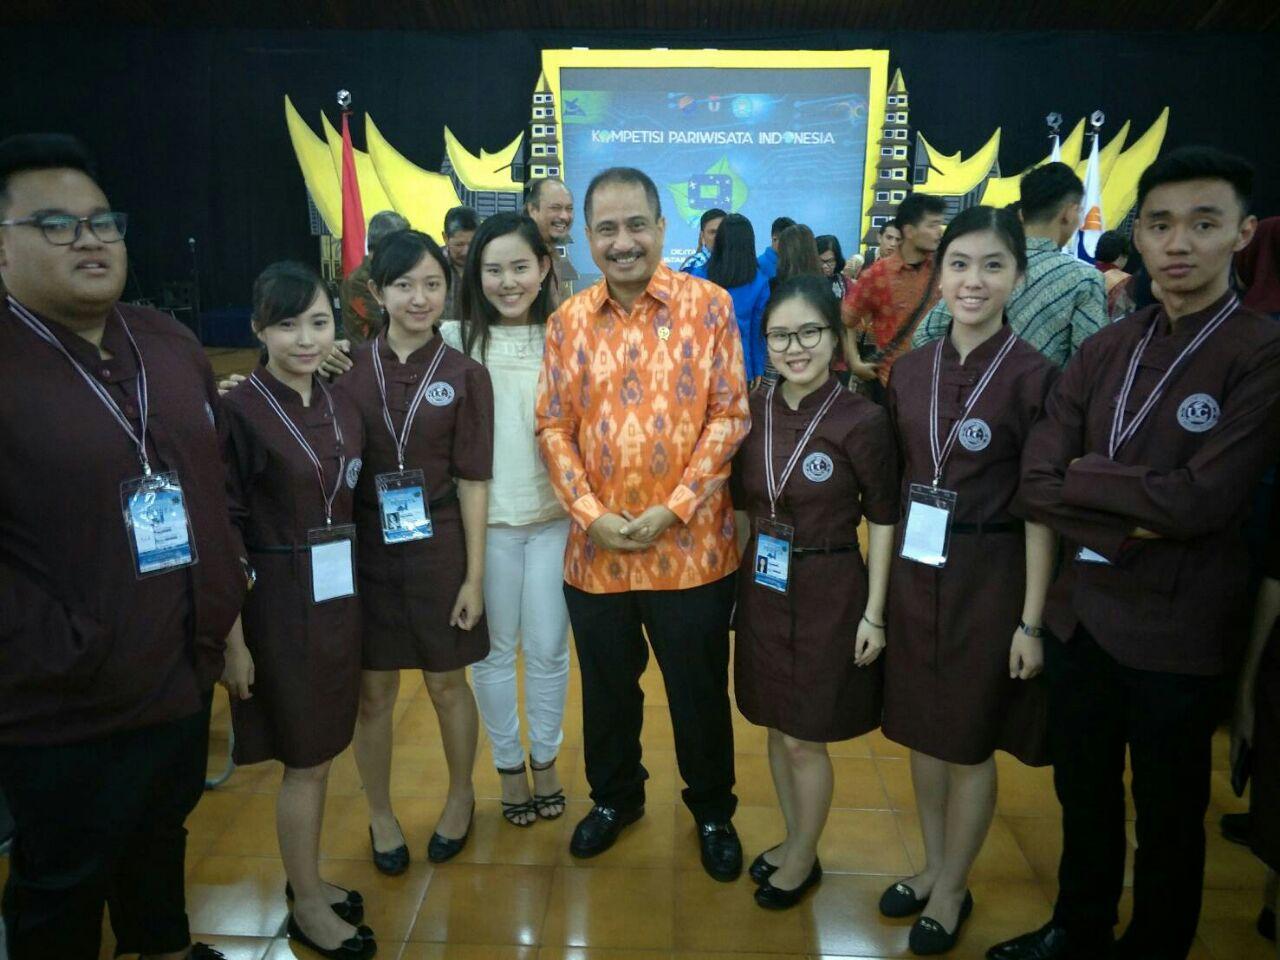 Juara 2 Kompetisi Pariwisata Indonesia untuk kategori Business Event Proposal 2018